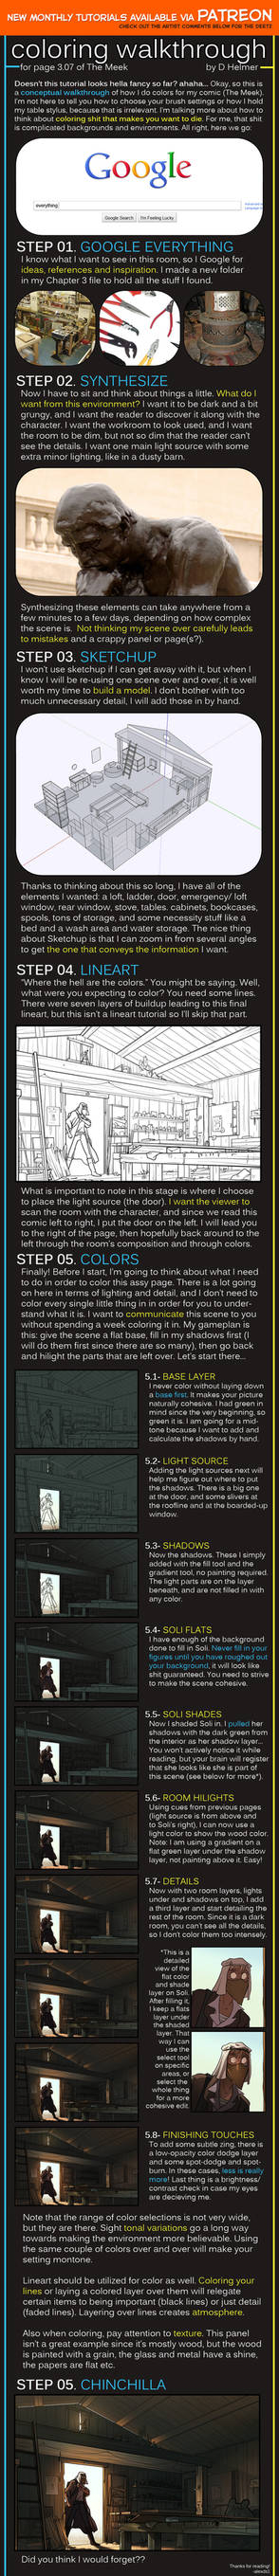 Coloring Walkthrough